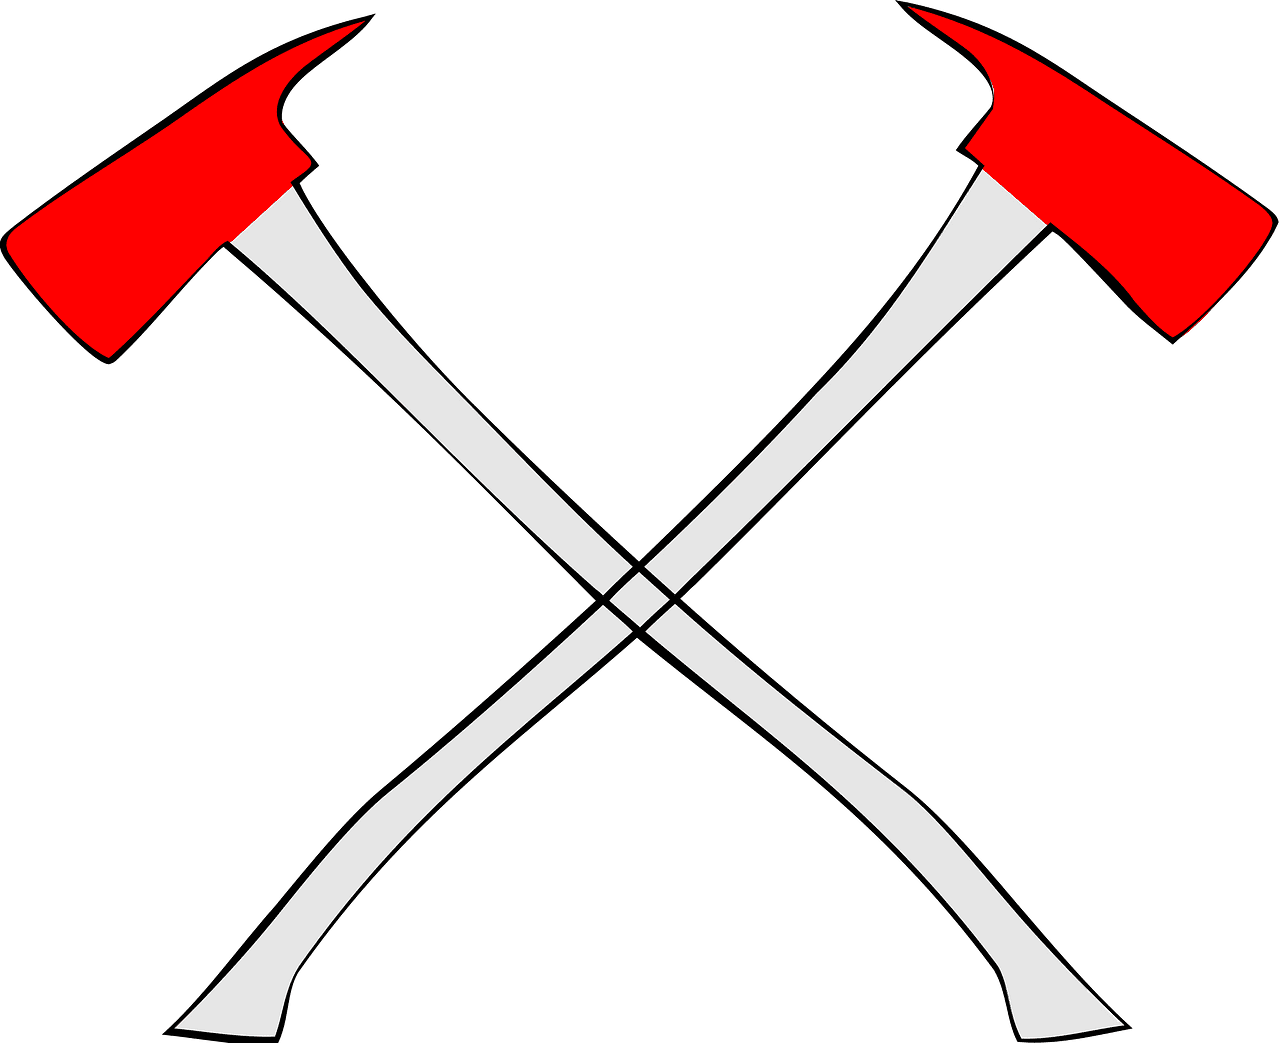 Axes clipart transparent